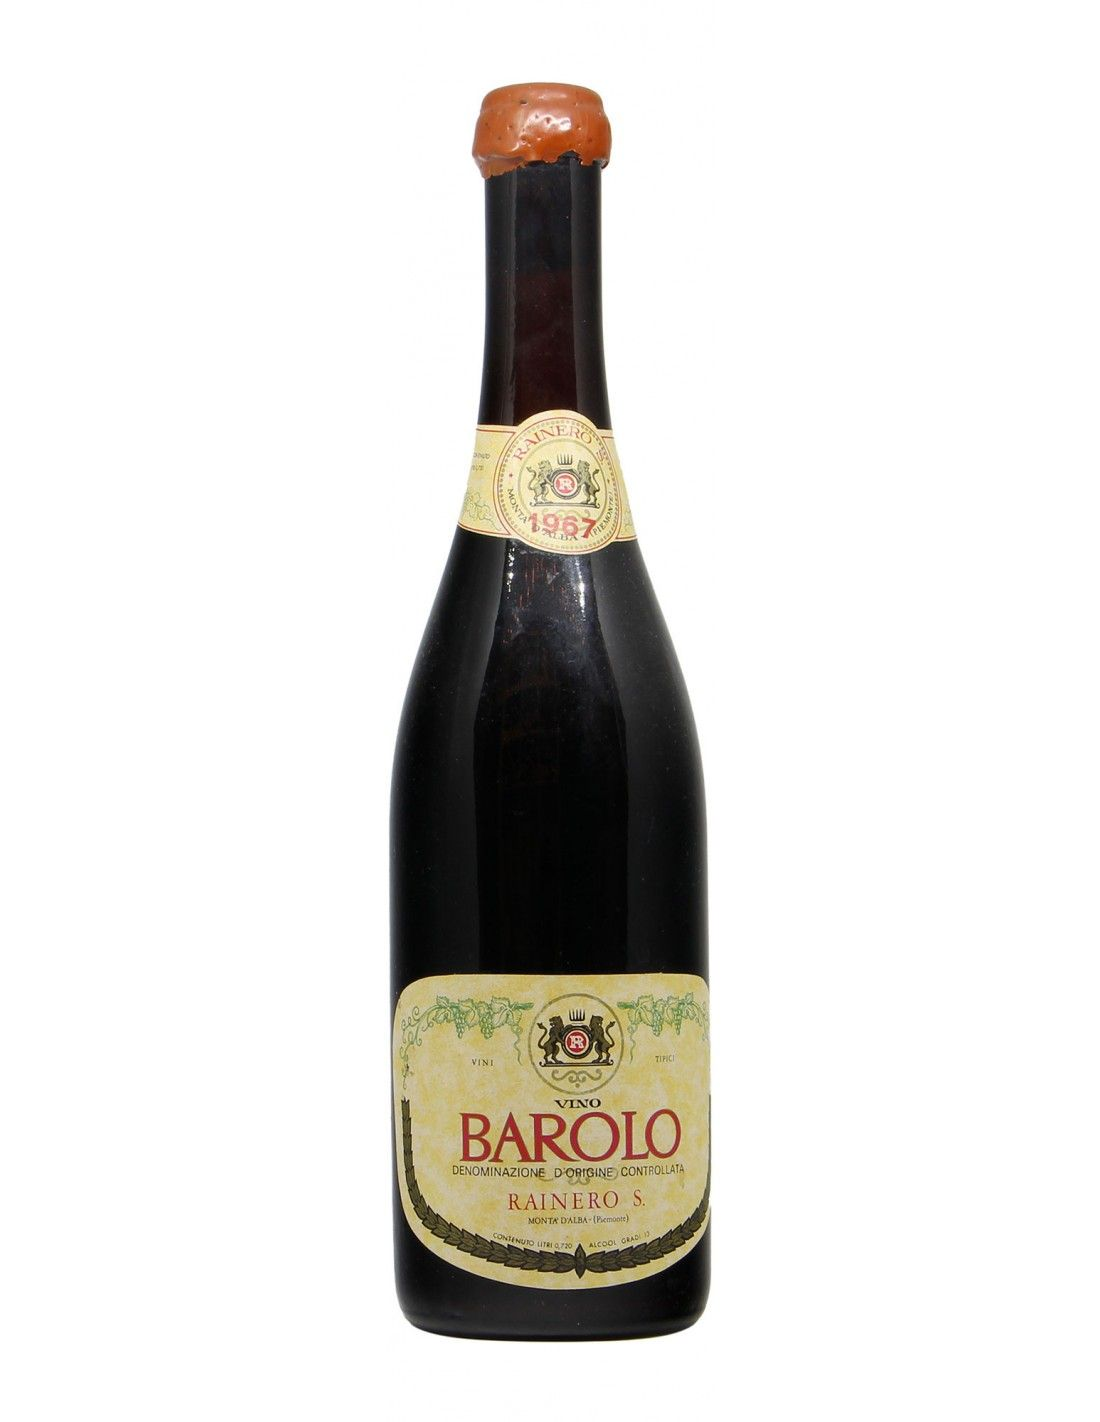 BAROLO 1967 RAINERO Grandi Bottiglie